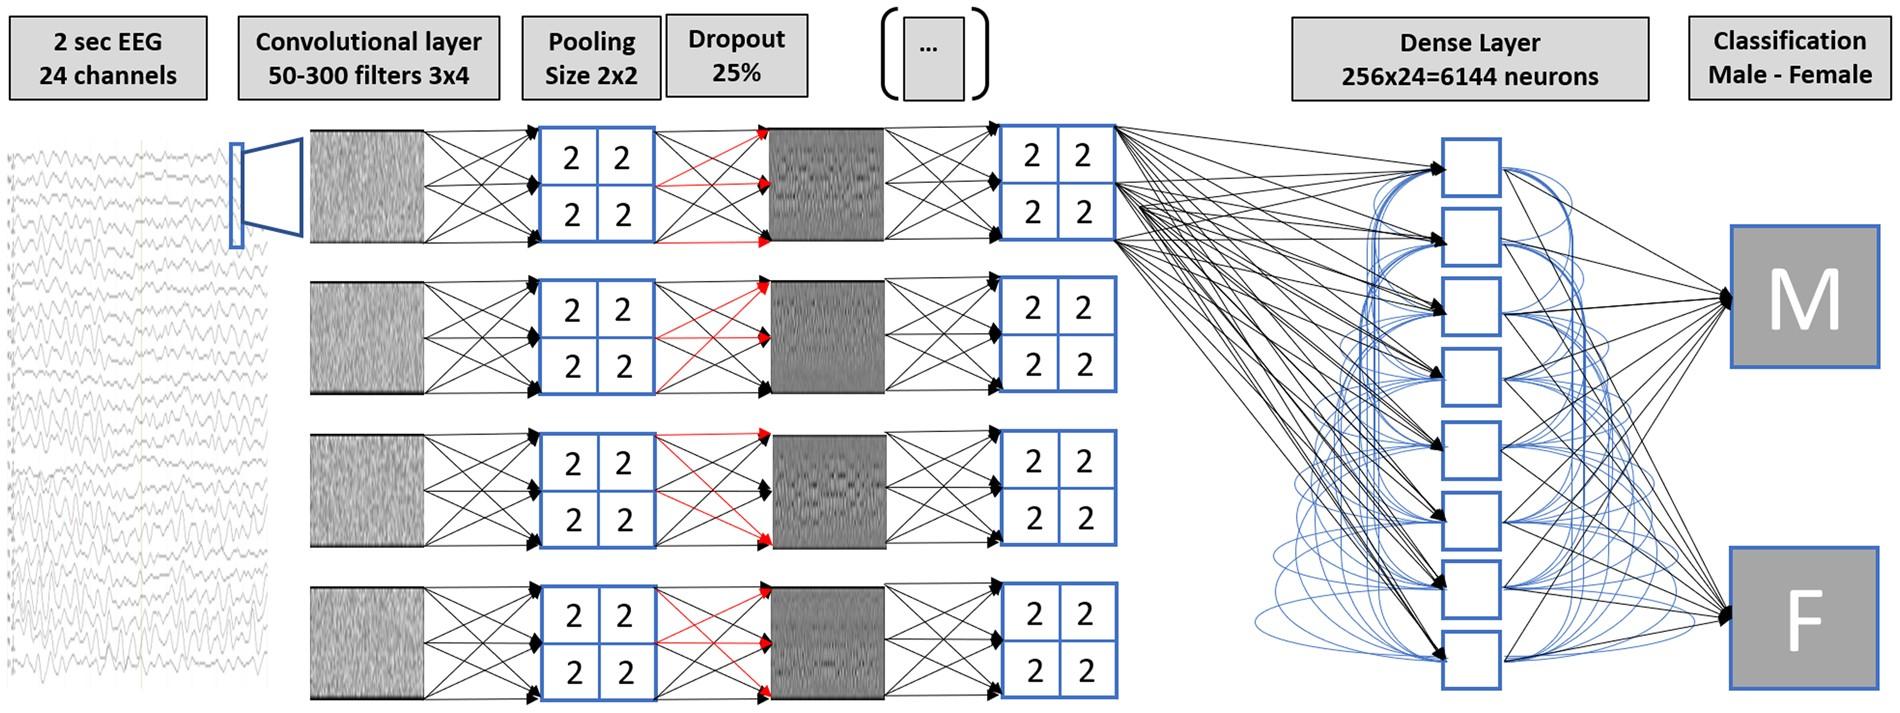 Predicting sex from brain rhythms with deep learning